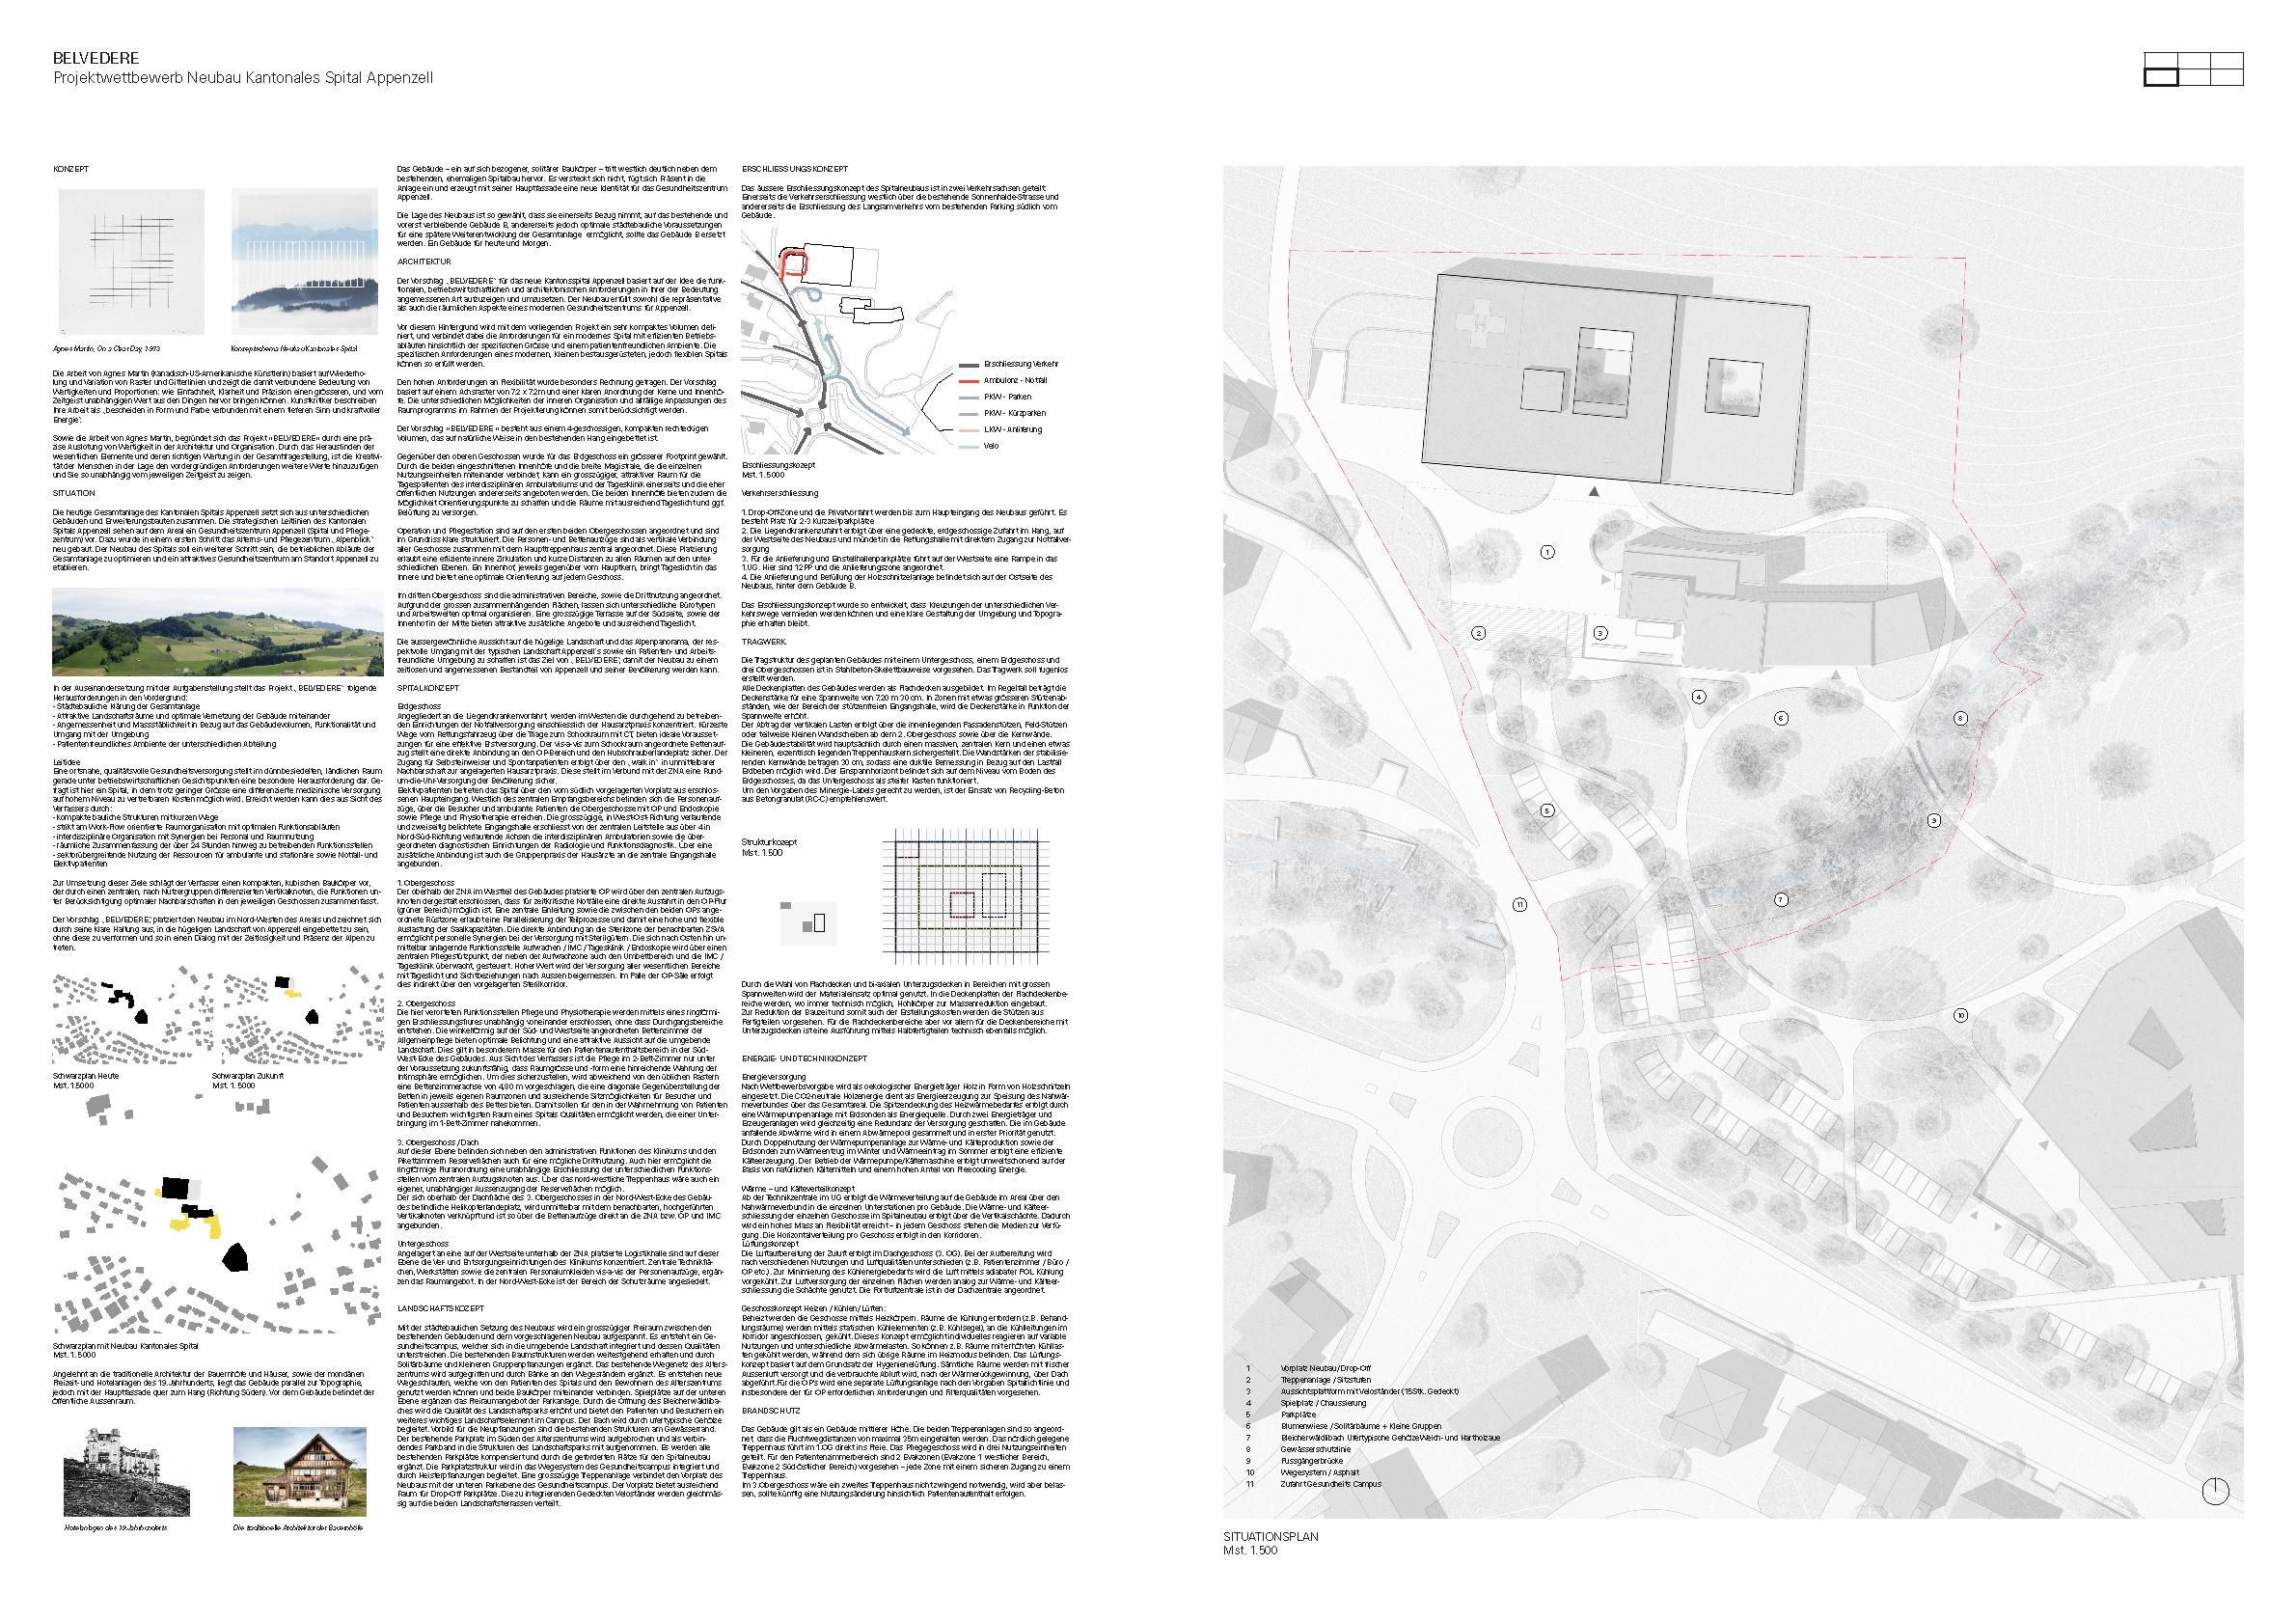 Result: Neubau Kantonales Spital...competitionline